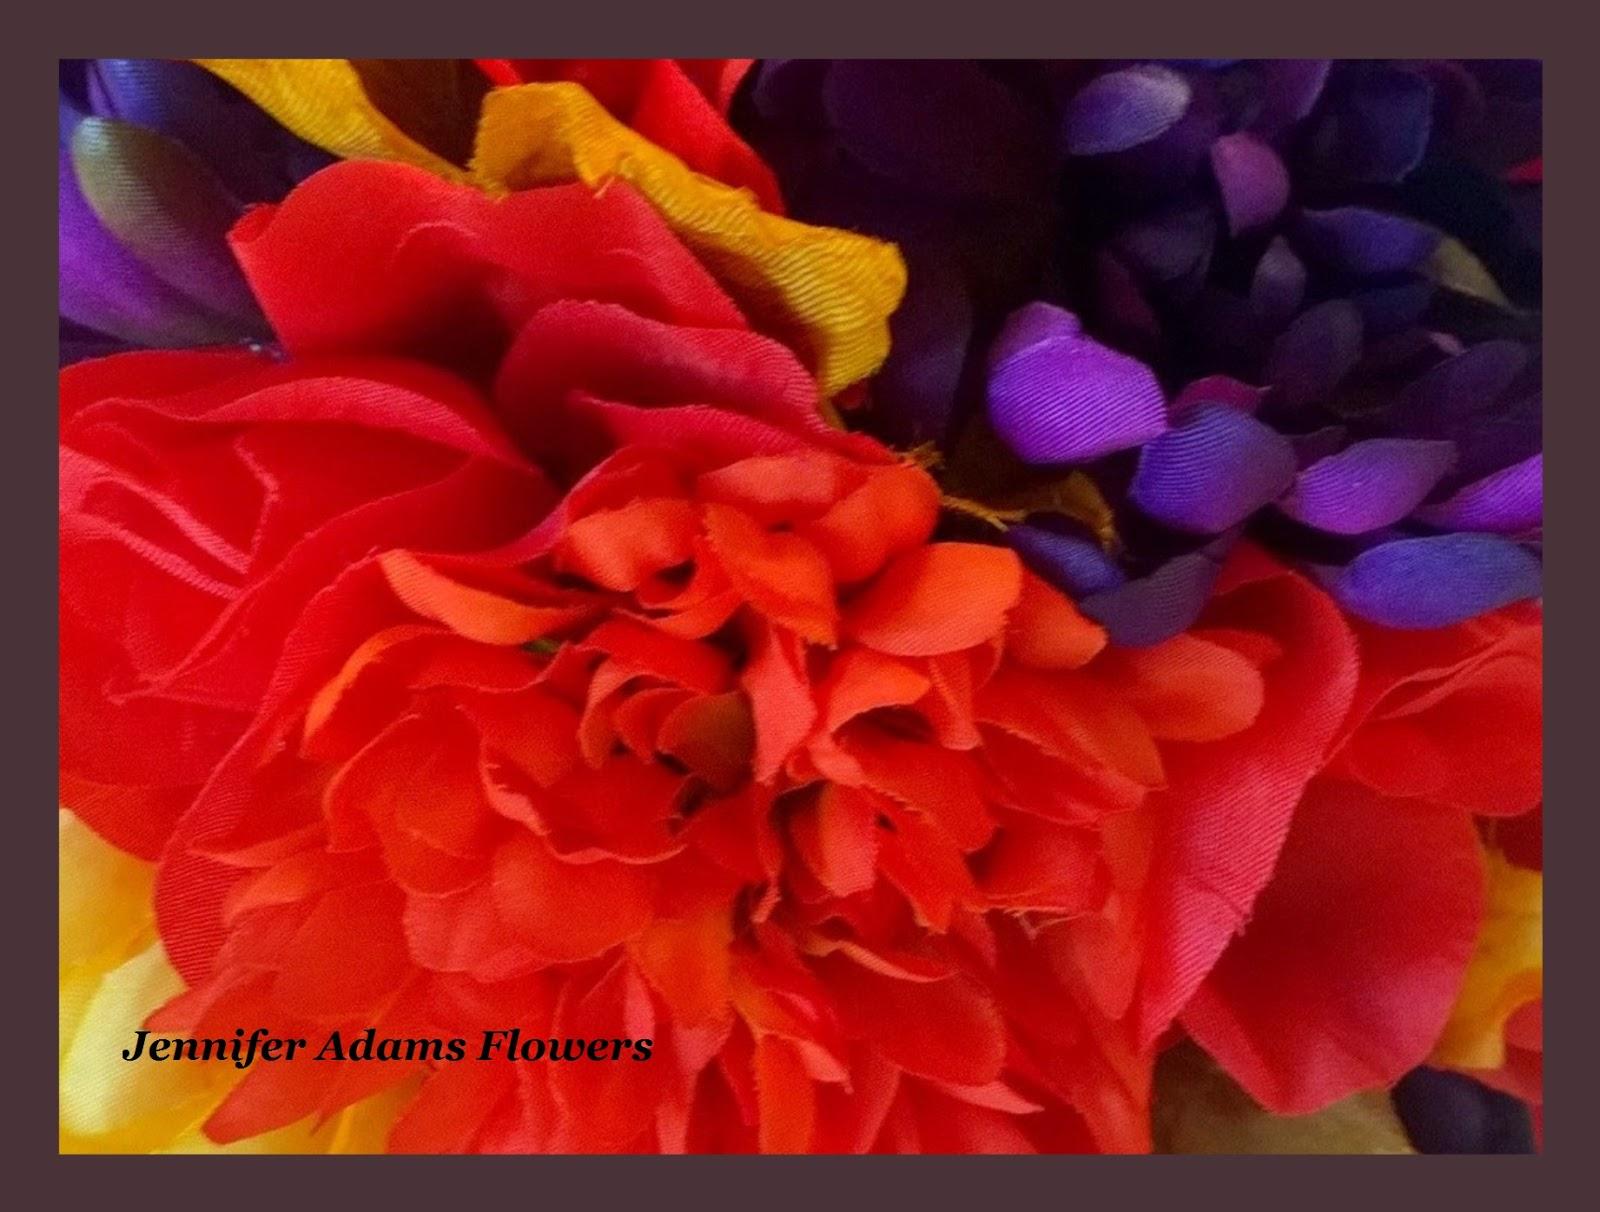 Jennifer Adams Flowers Autumn Mix 17 Pc Package 2015